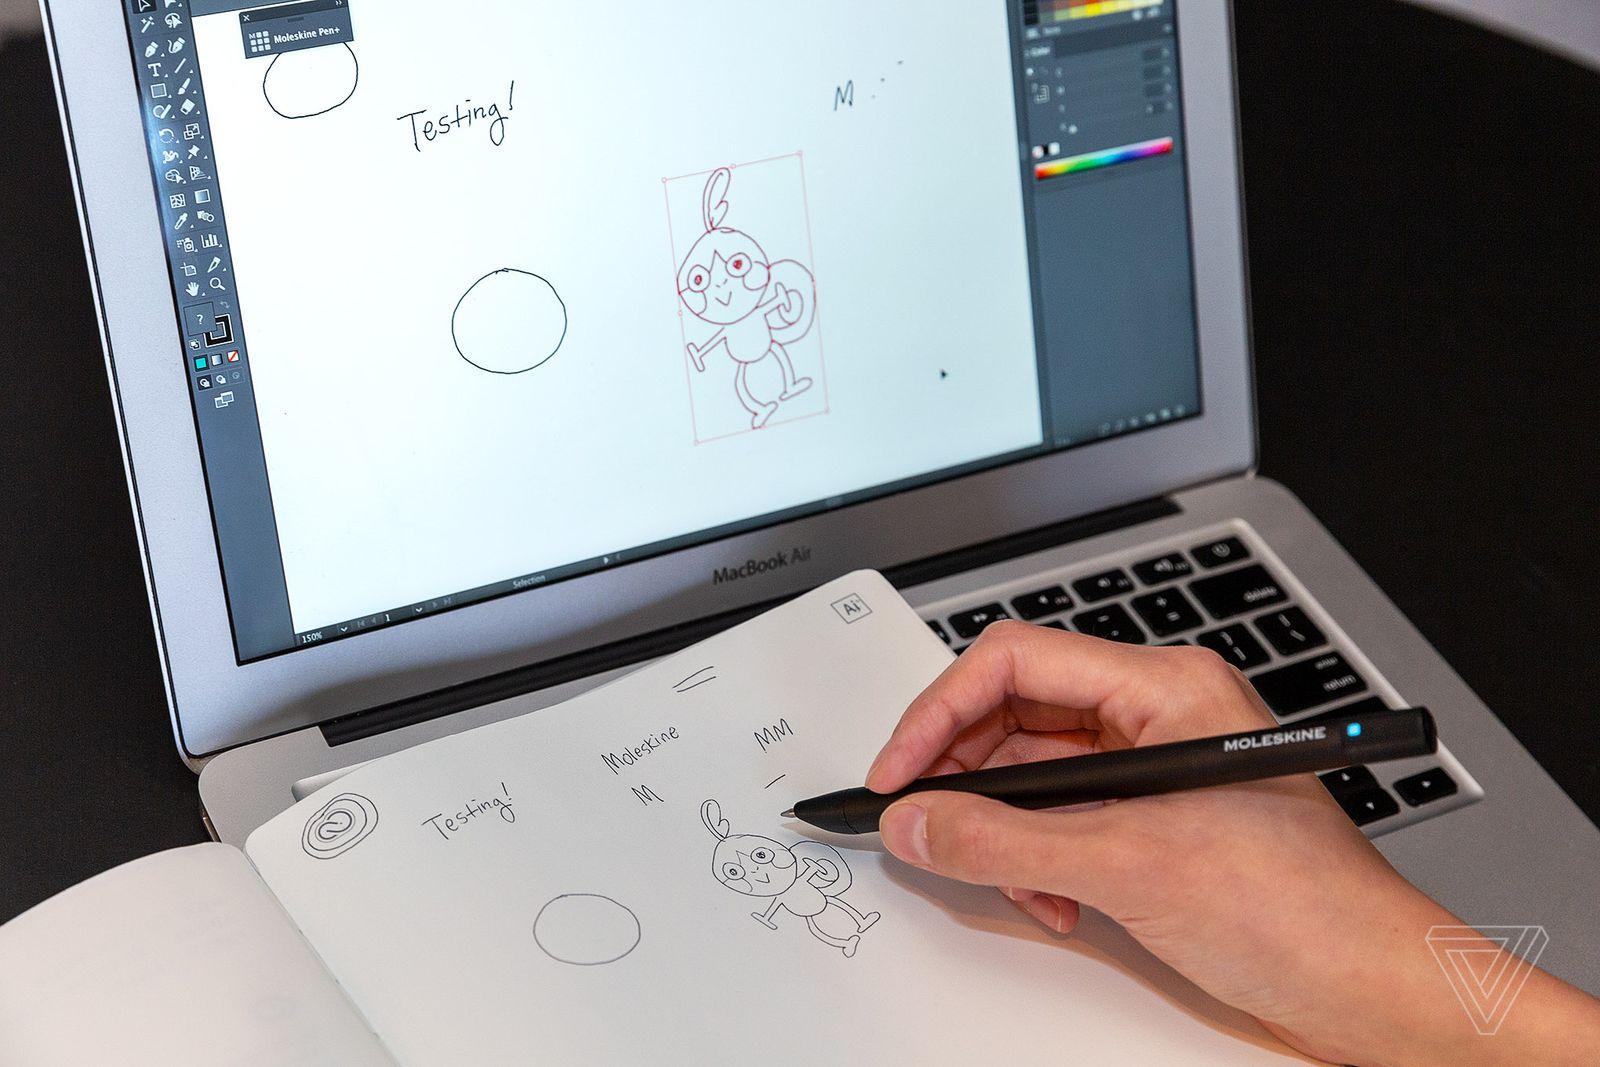 Moleskine et Adobe illustrator Carnet de croquis